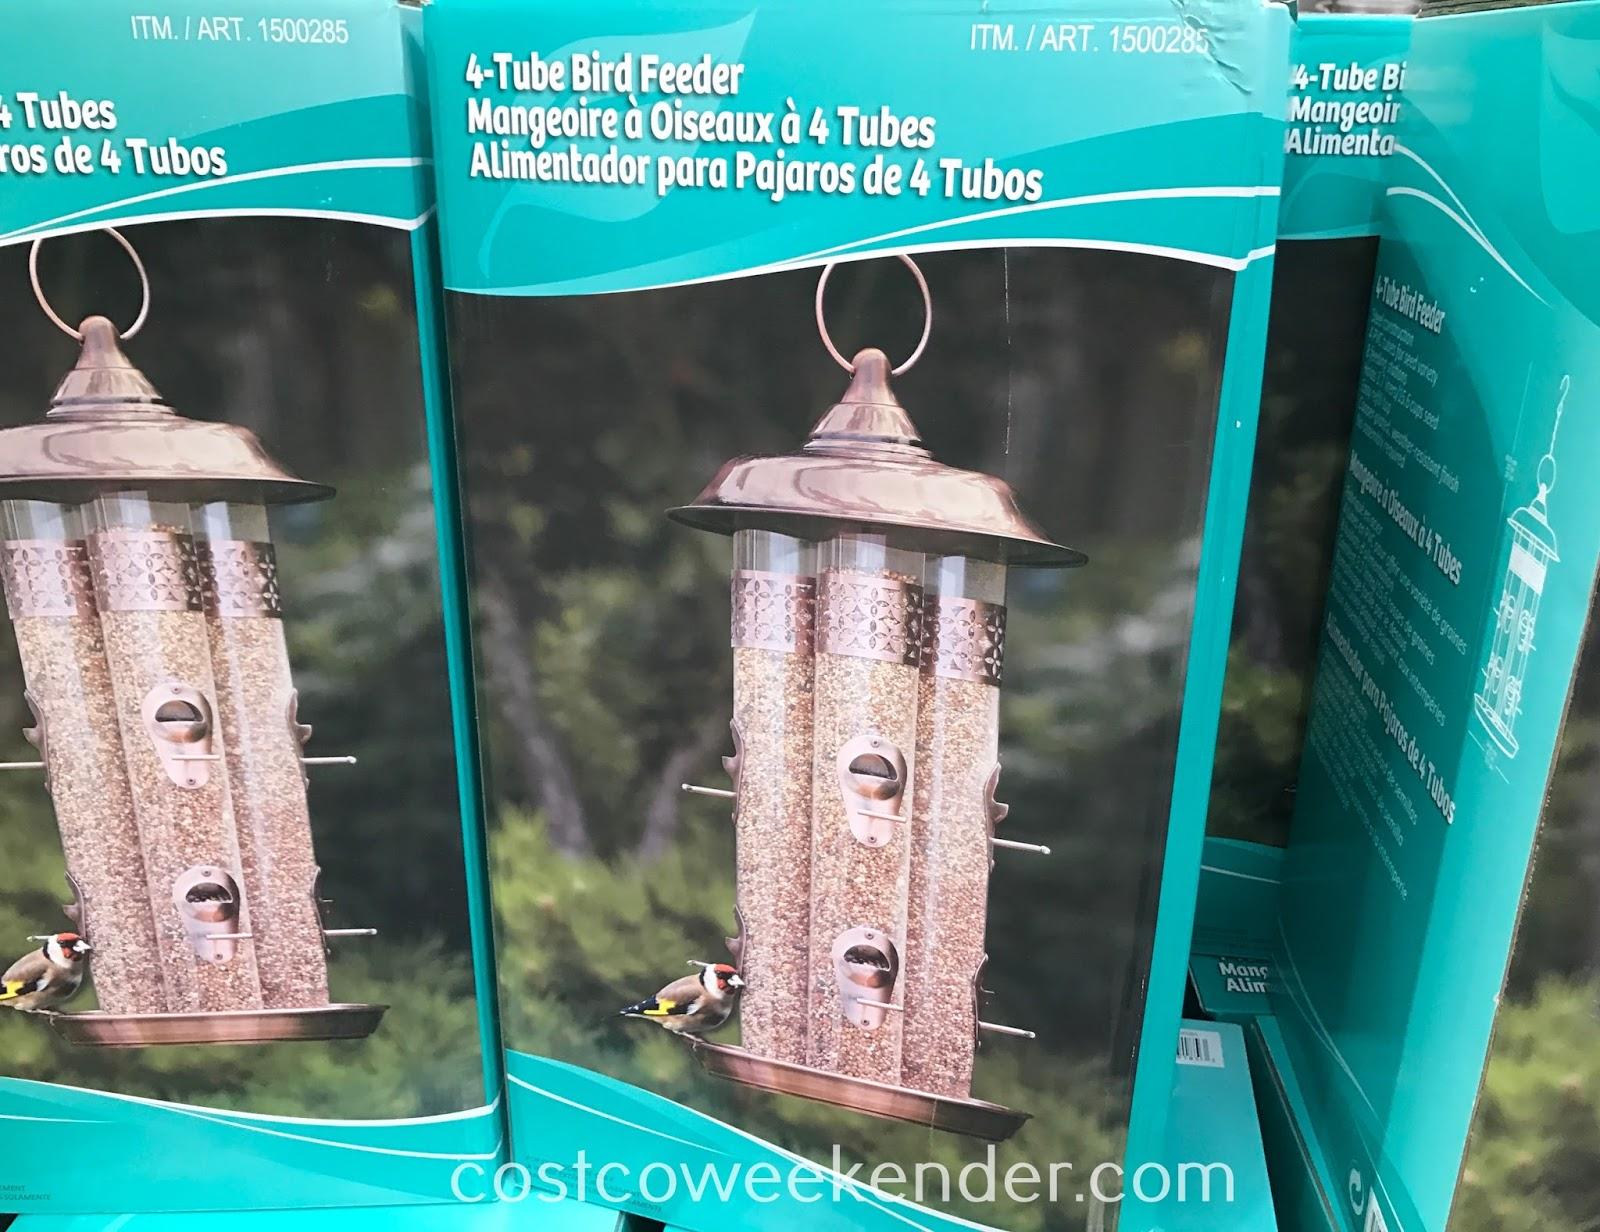 Invite birds to come over with the StyleCraft 4-Tube Bird Feeder